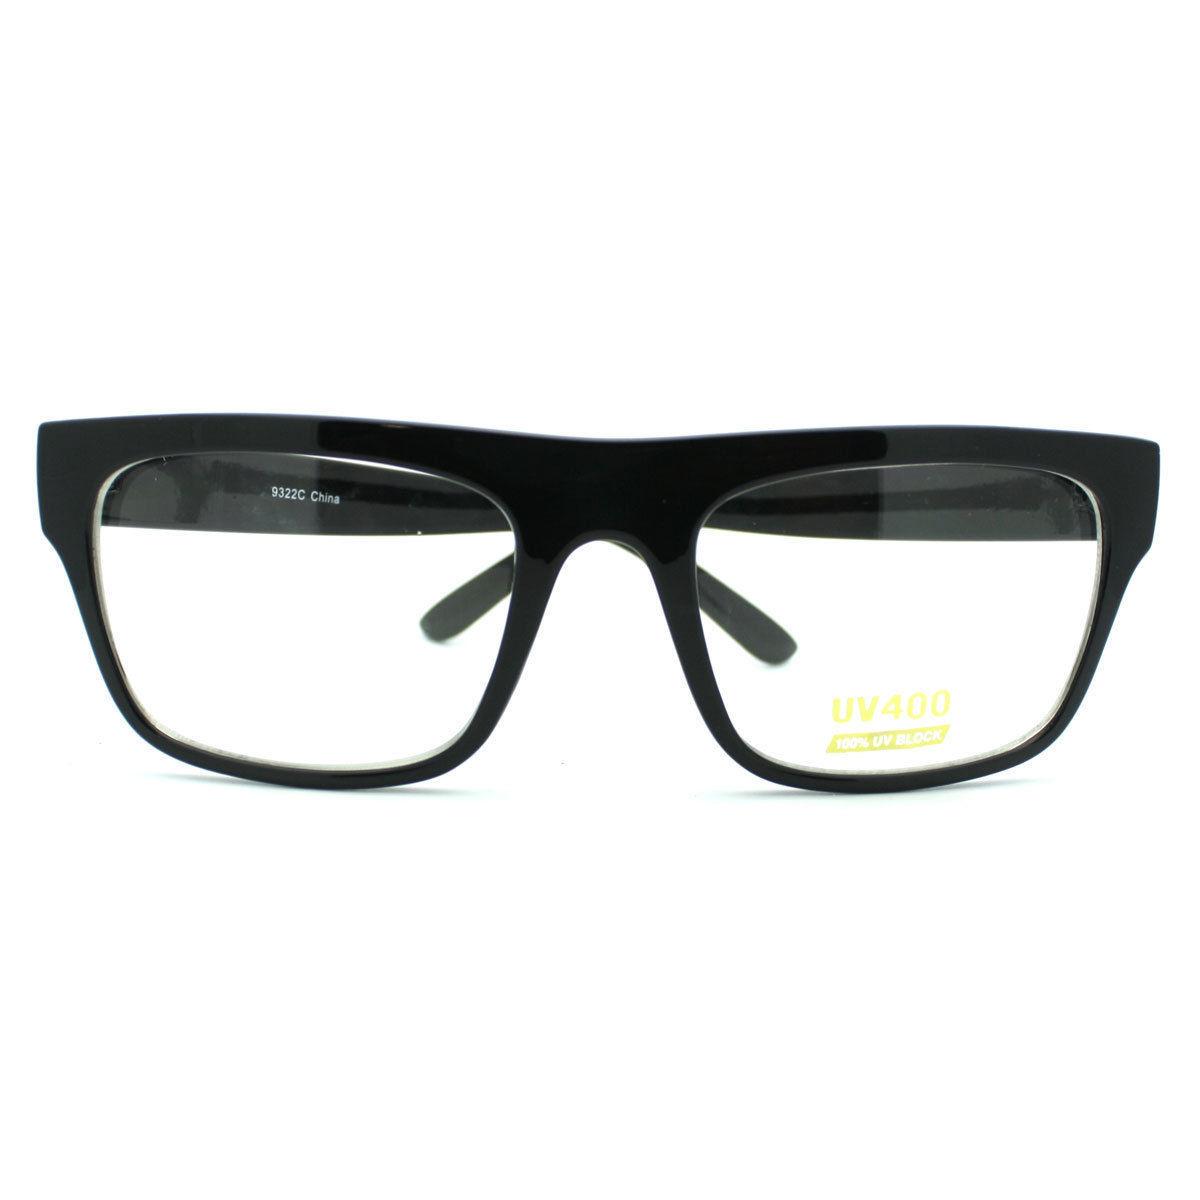 Unisex Rectangular Eyeglasses Classic Clear Optical Lens Frame BLACK